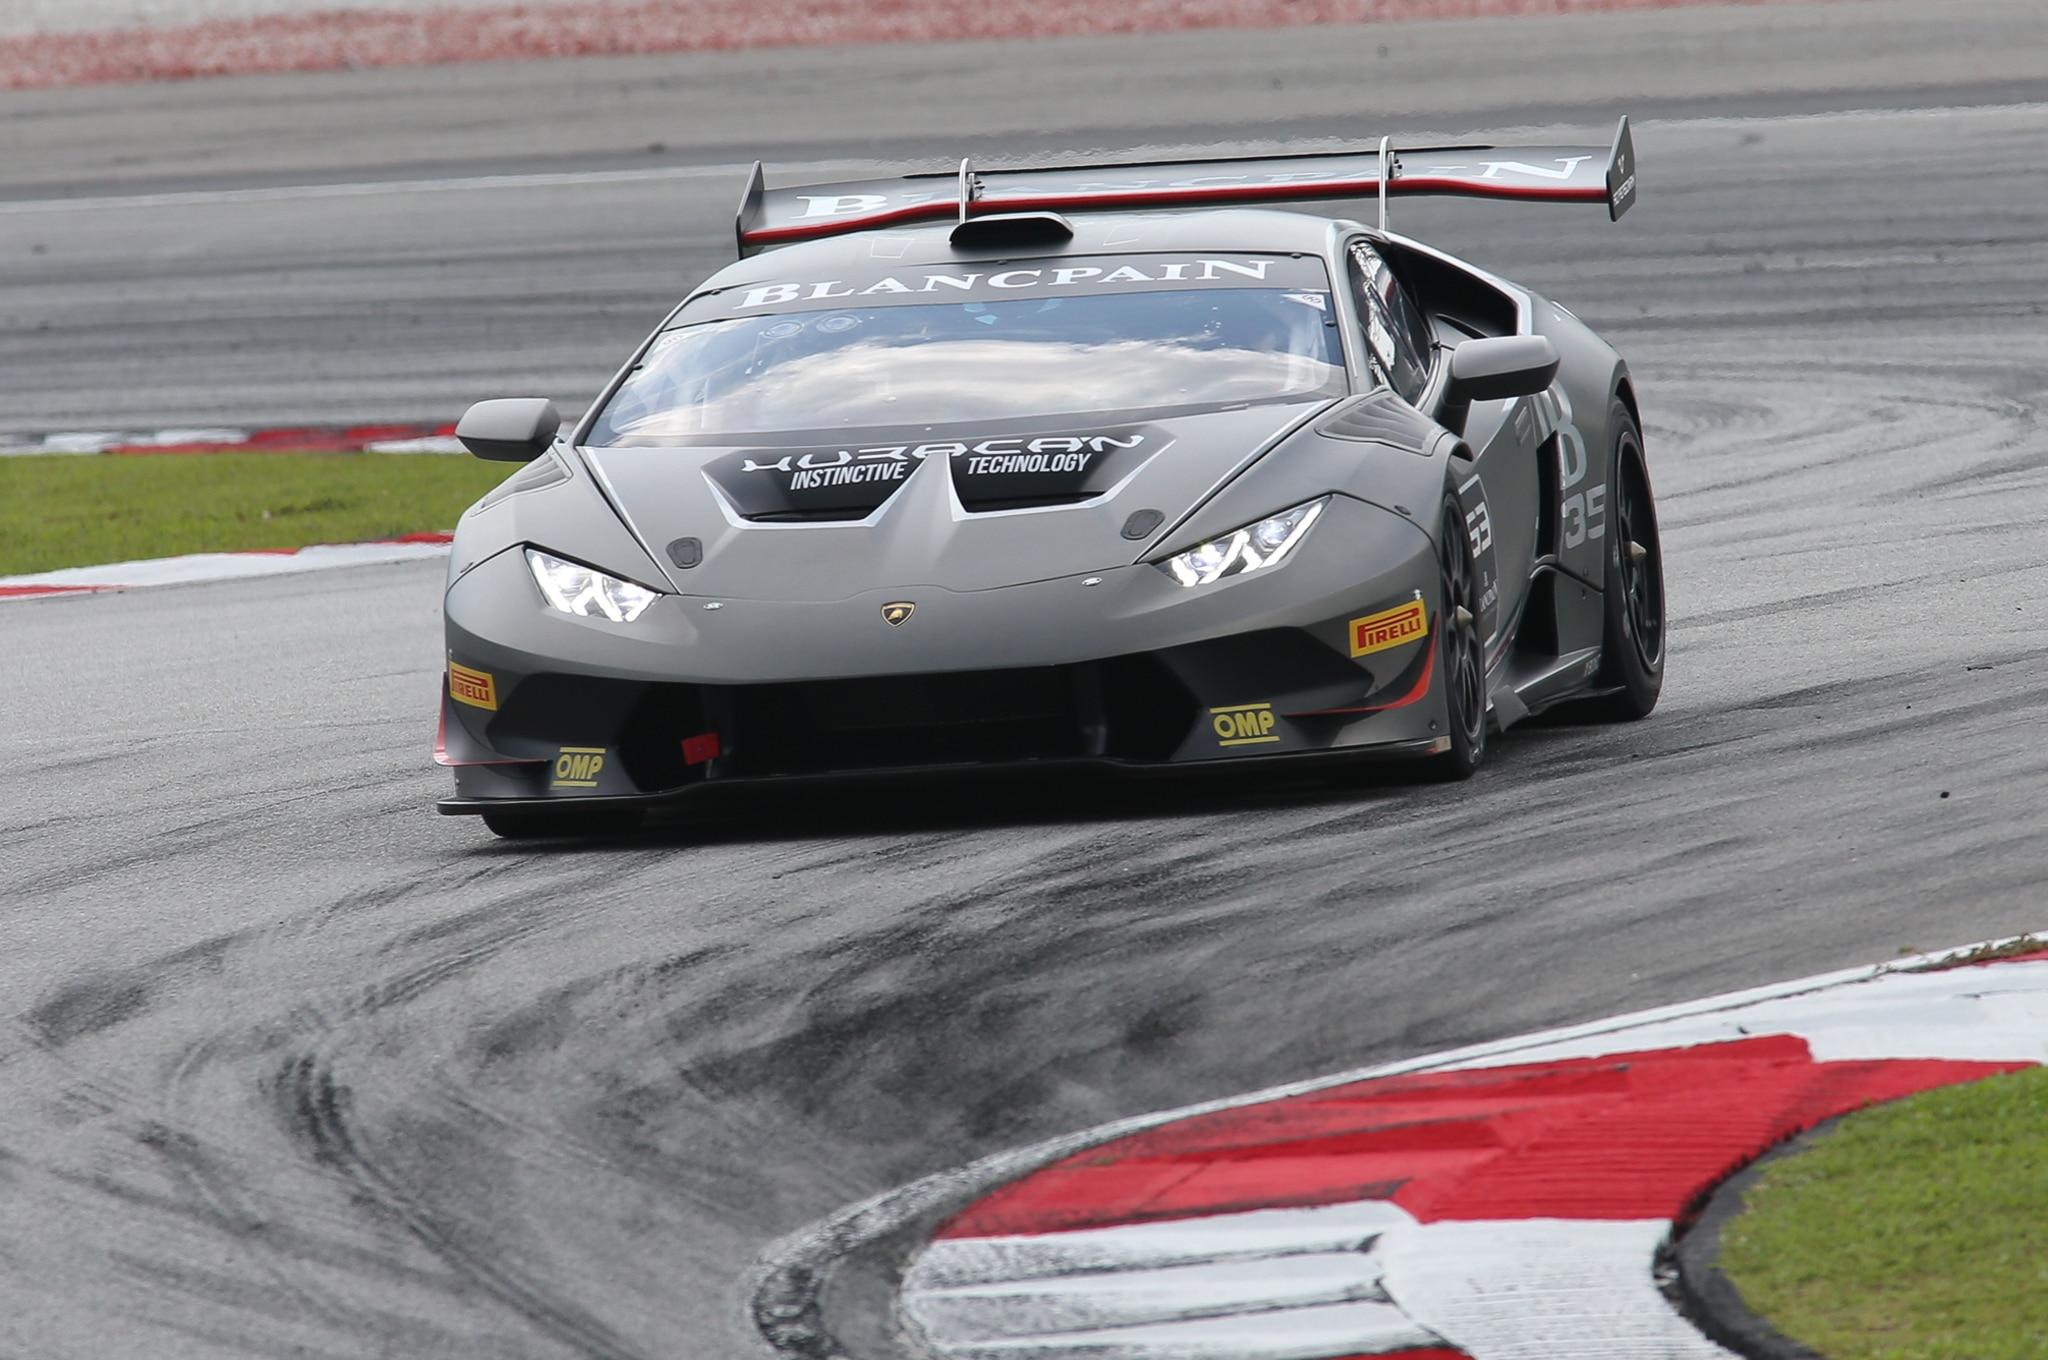 2015-Lamborghini-Huracan-LP-620-2-Super-Trofeo-front-three-quarter-in-motion-11 Gorgeous Lamborghini Huracan Lp620-2 Super Trofeo top Speed Cars Trend